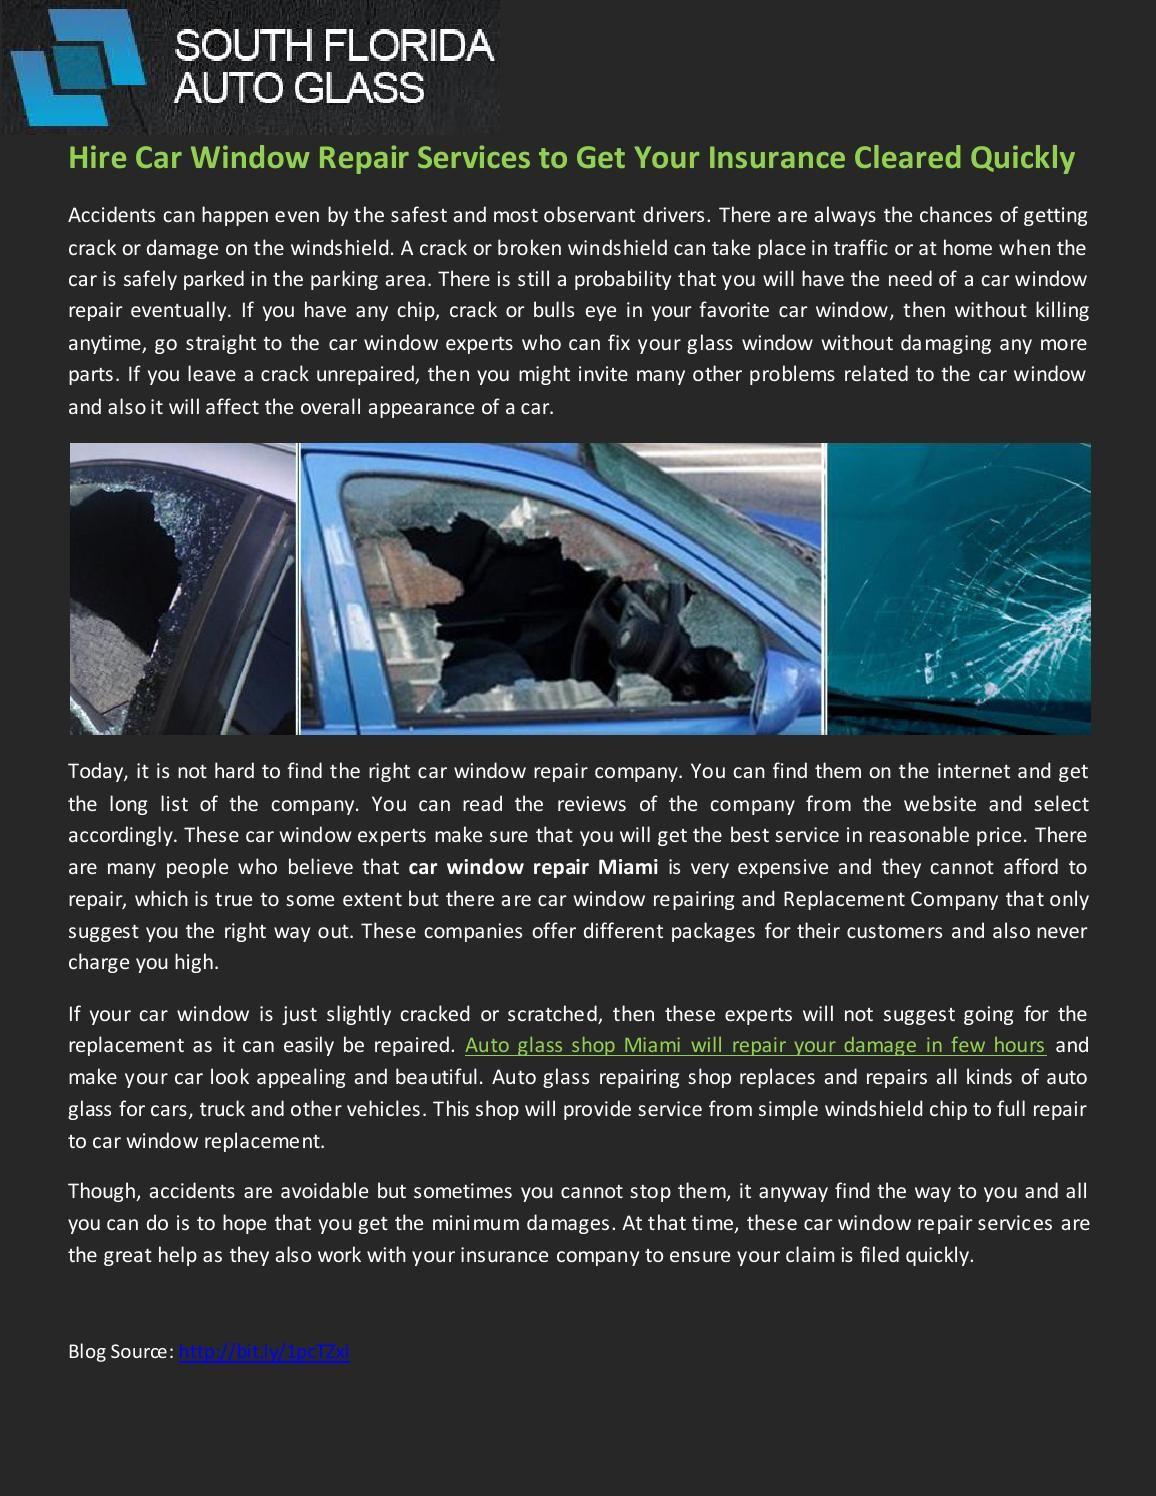 Hire Car Window Repair Services Window Repair Car Window Repair